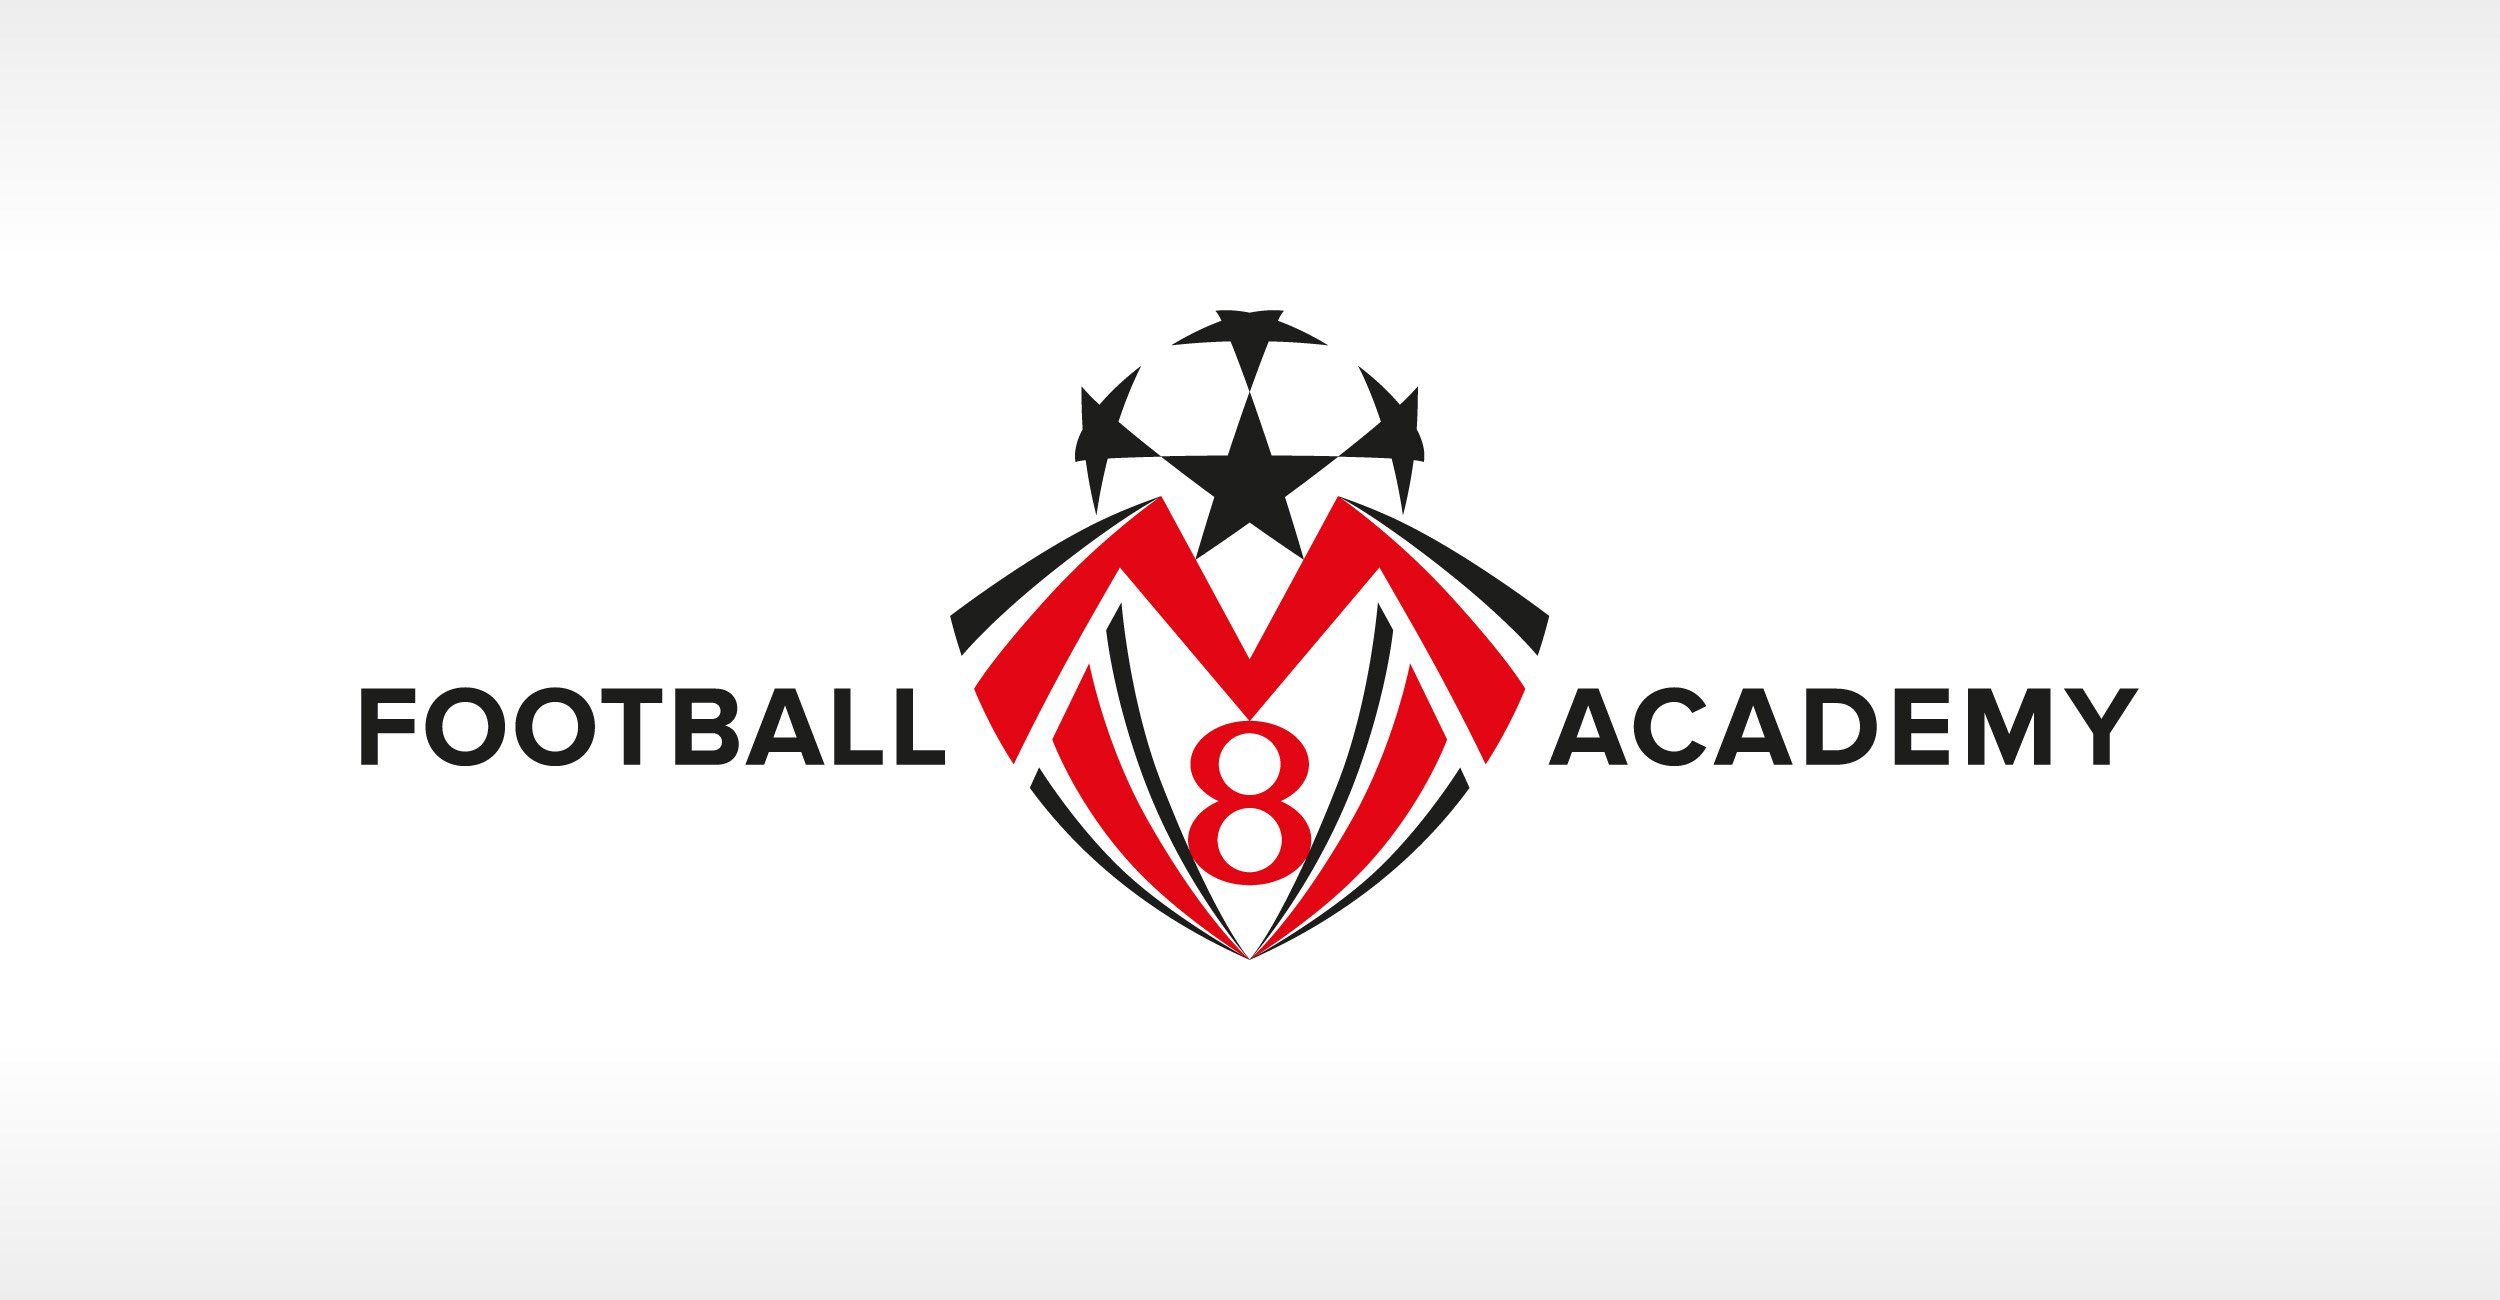 MV8 Football Academy Brand Design